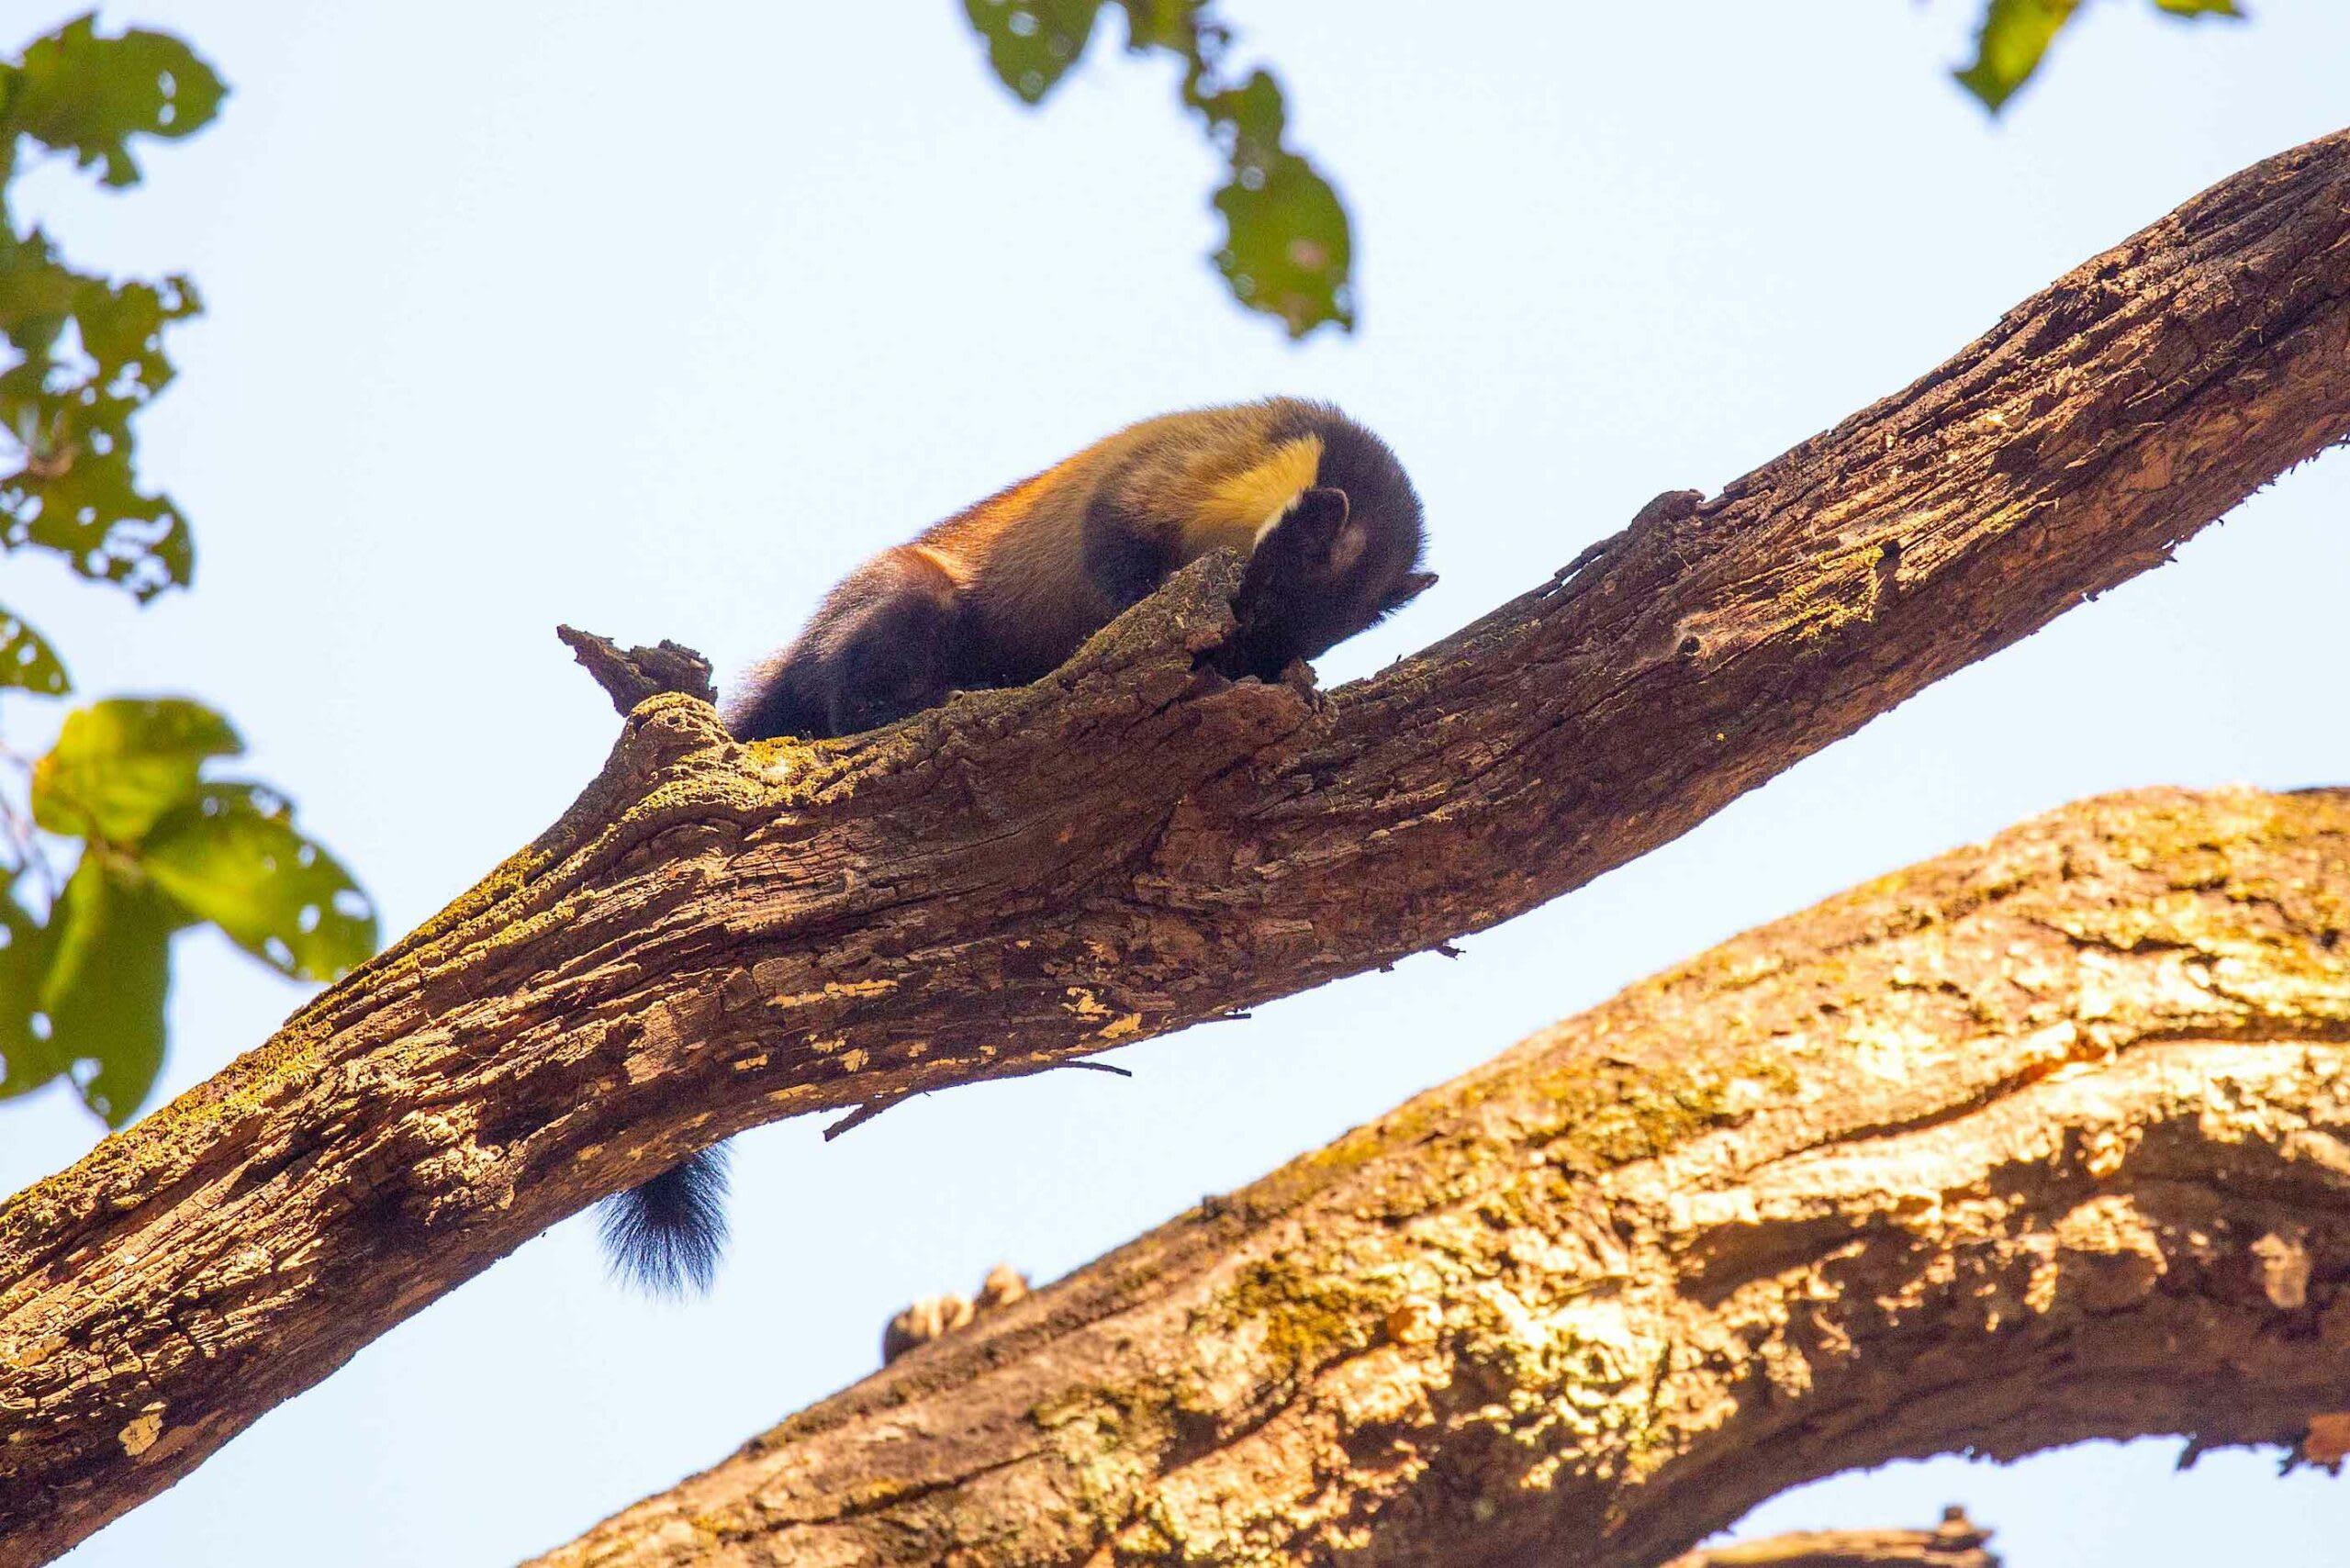 corbett-yellow-throated-marten-on-a-tree-raiding-bird-nest-nose